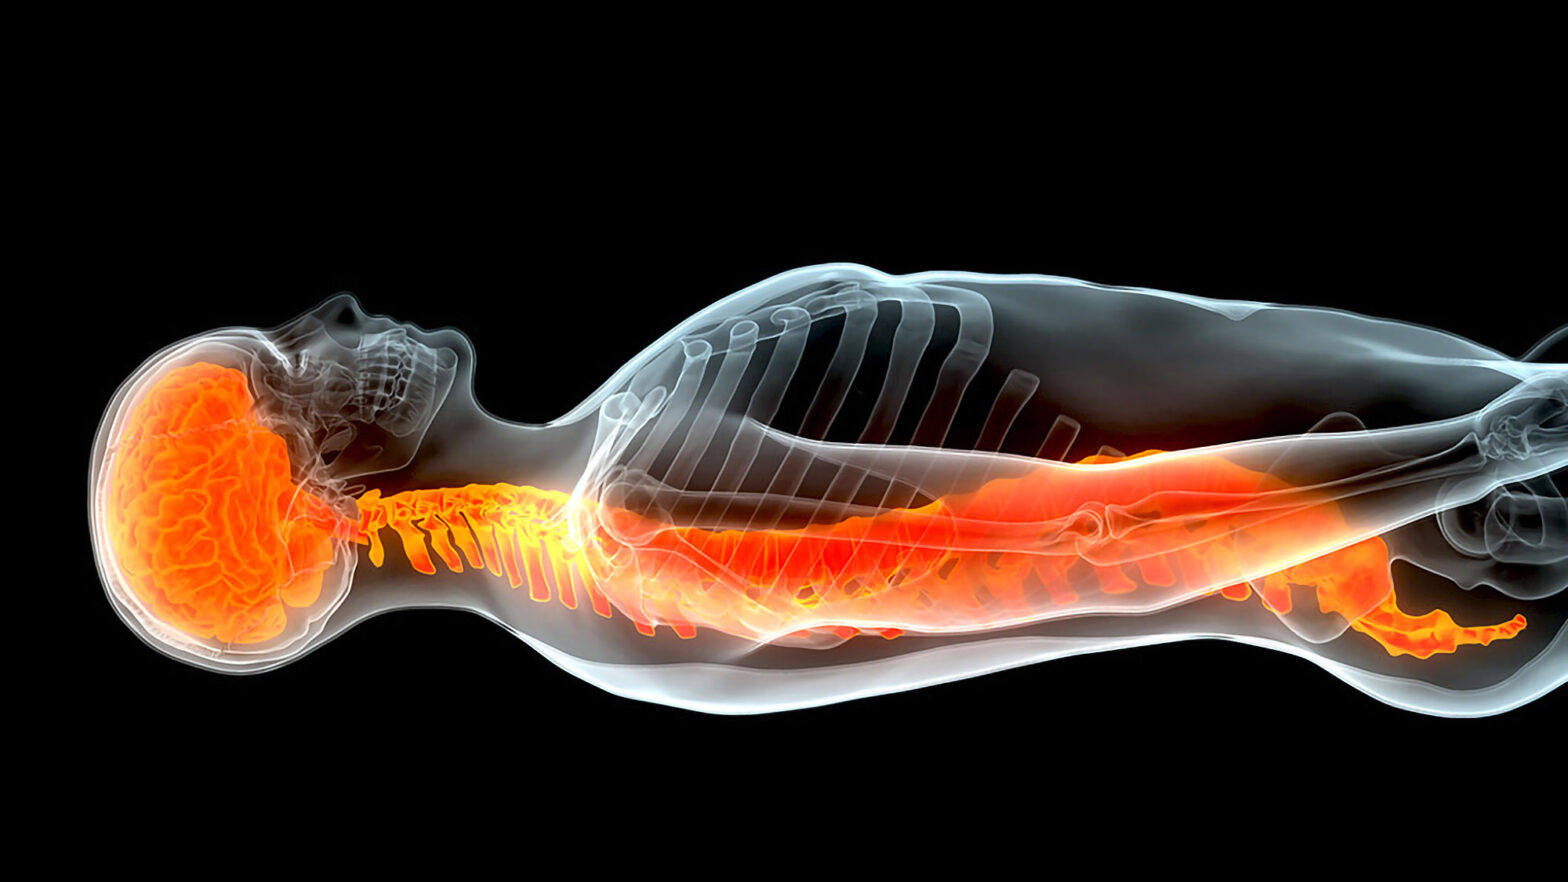 Spinal Cord Repair Using Stem Cells Yale University